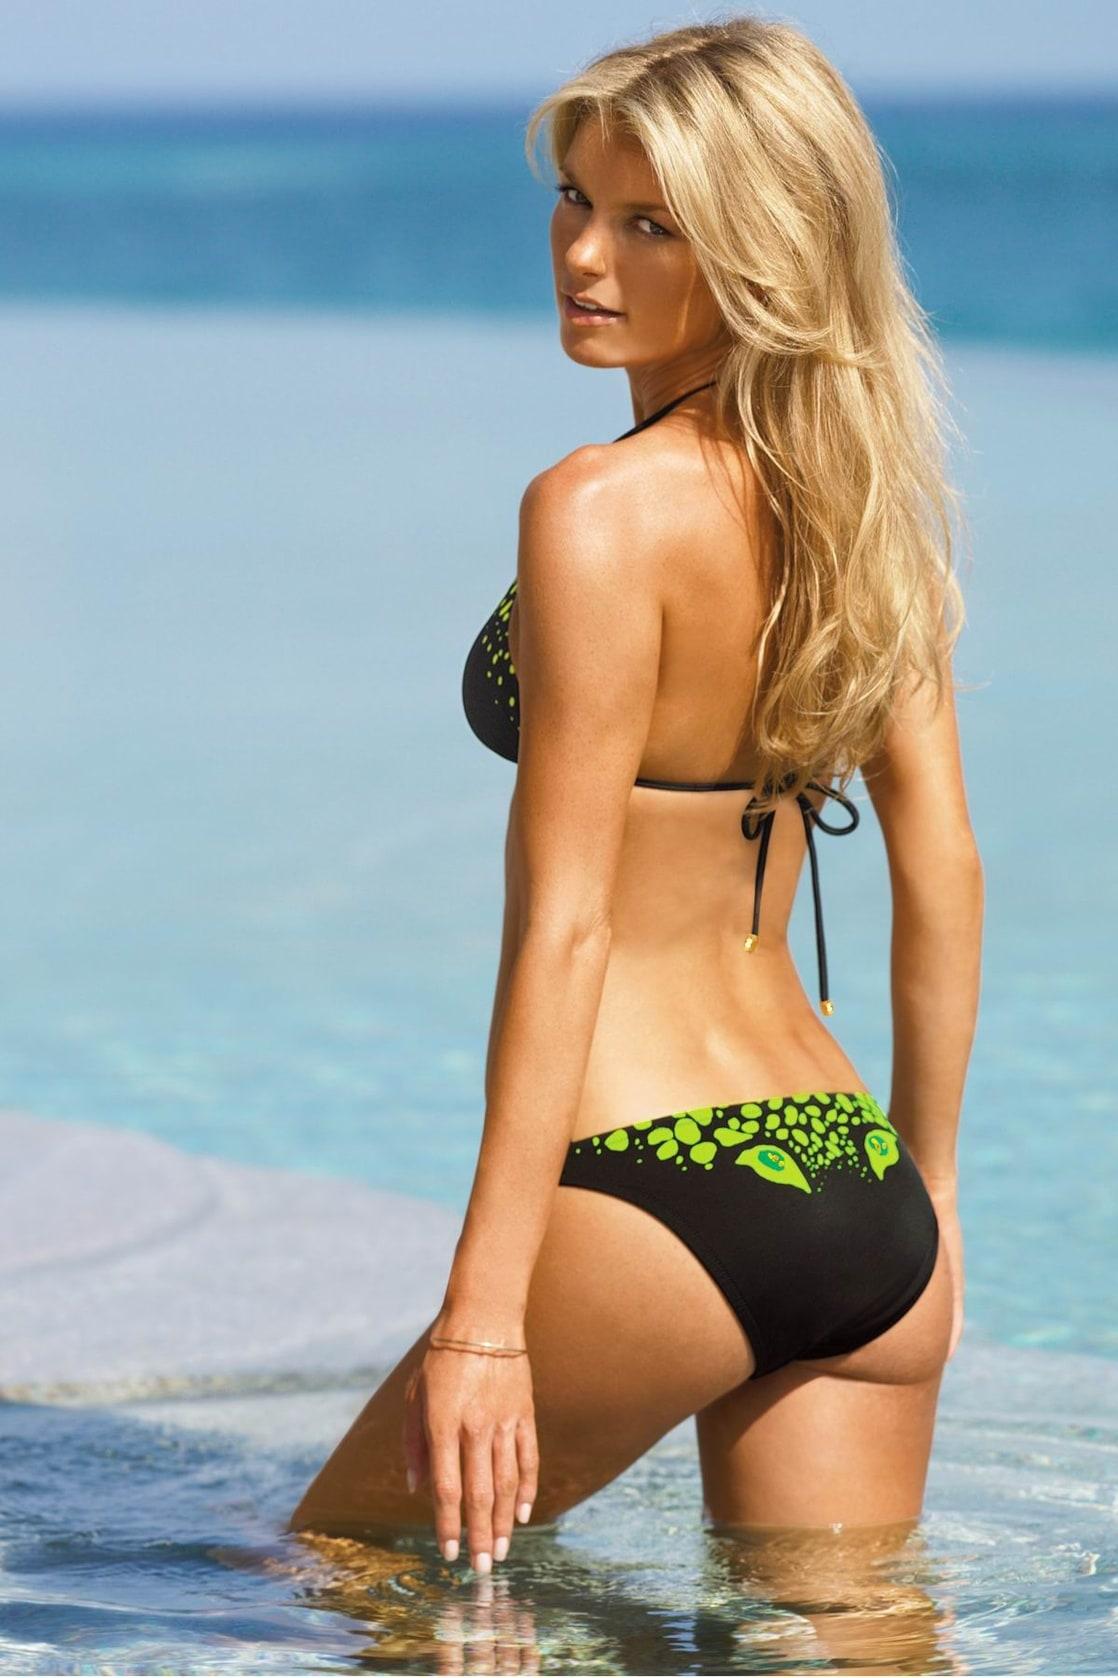 Asian girl Aunt beach bikini pool poolside suntan swimsuit love have